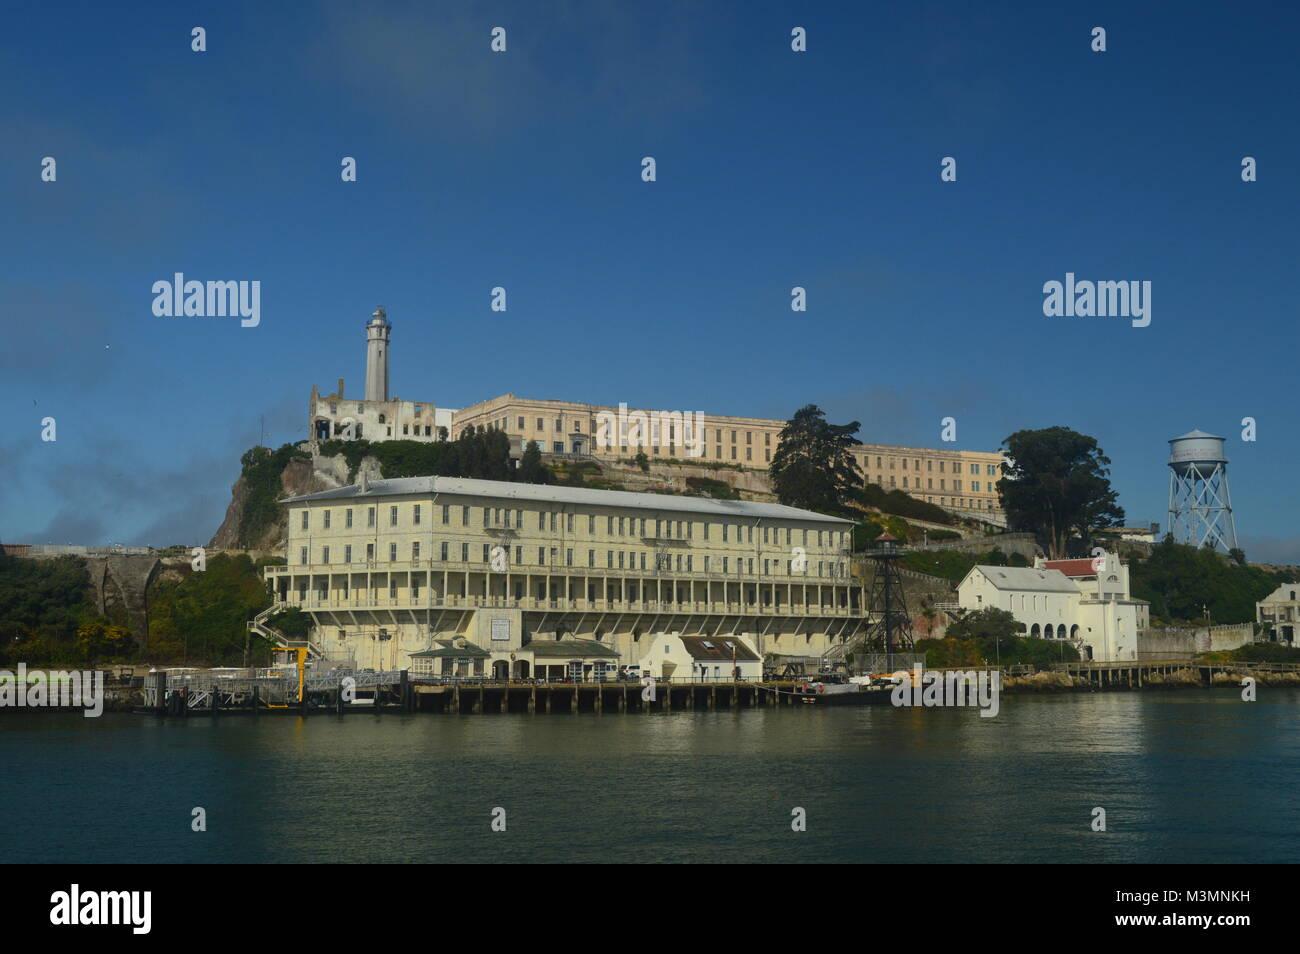 Views Of Alcatraz Island From The Sea. Travel Holidays Architecture June 30, 2017. San Francisco. California USA Stock Photo